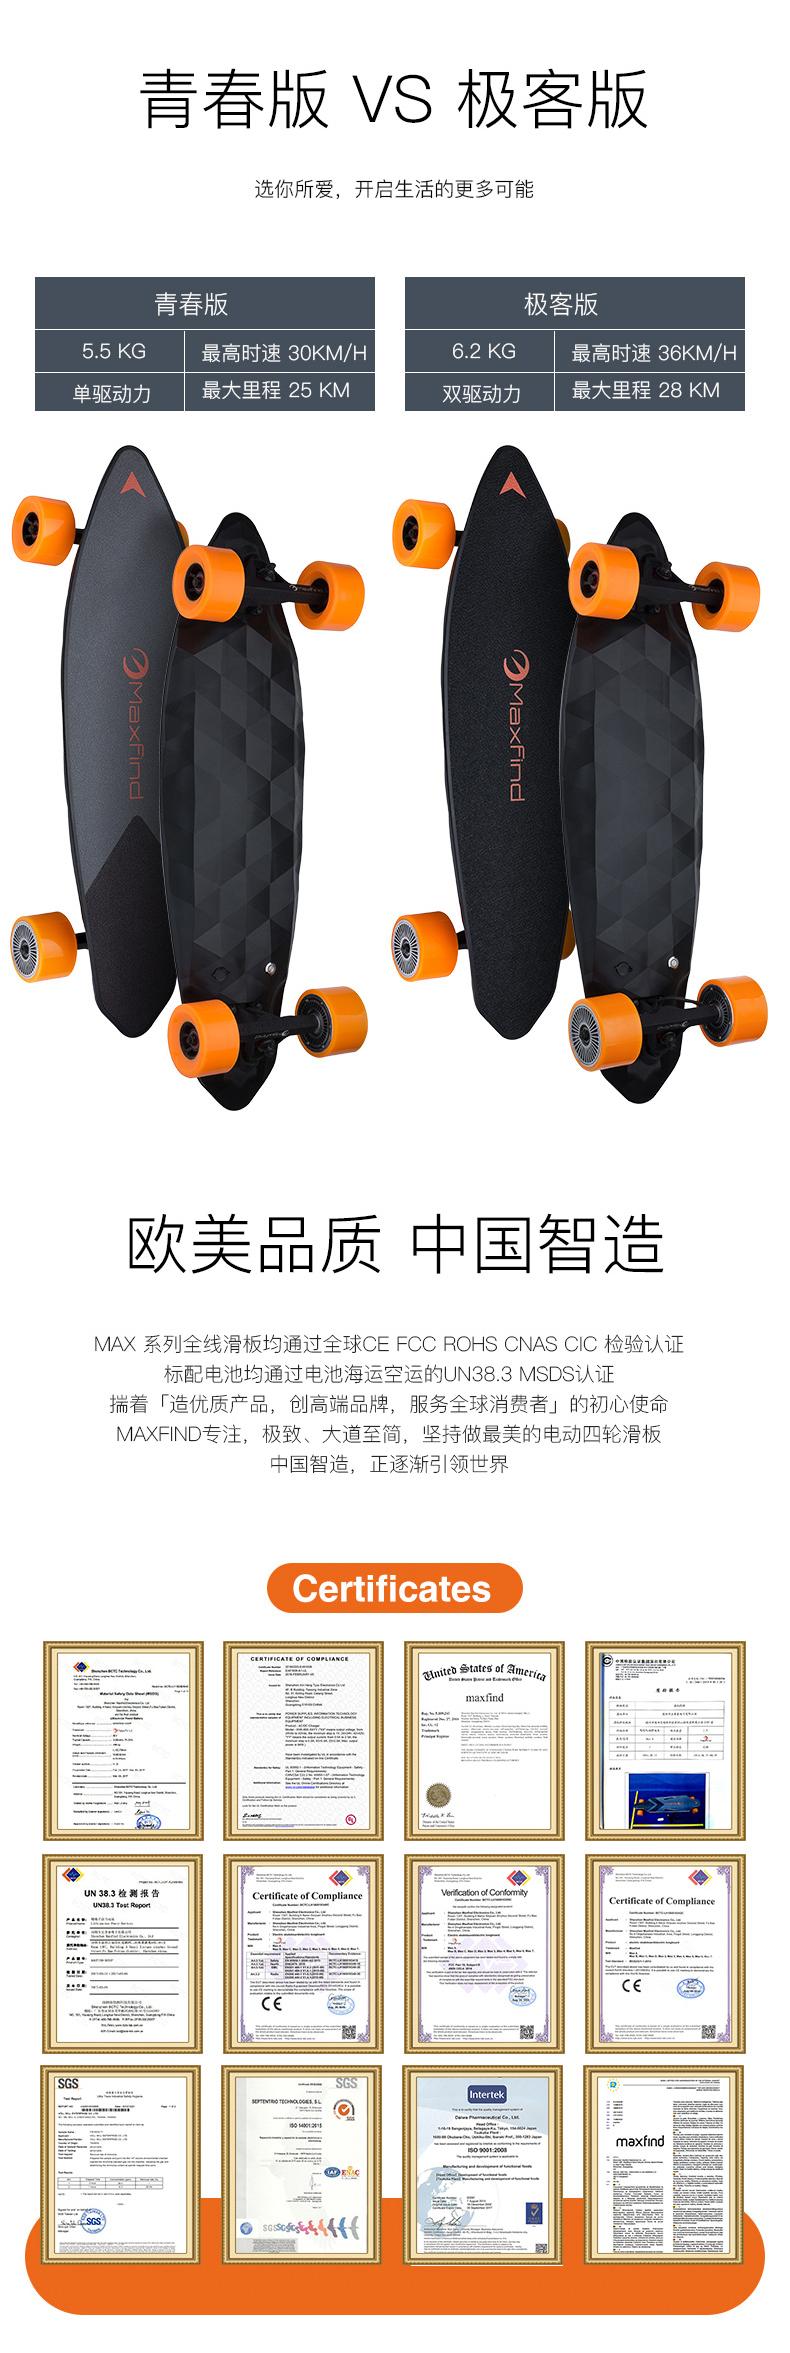 Maxfind Max2 四轮电动滑板-唯轮网